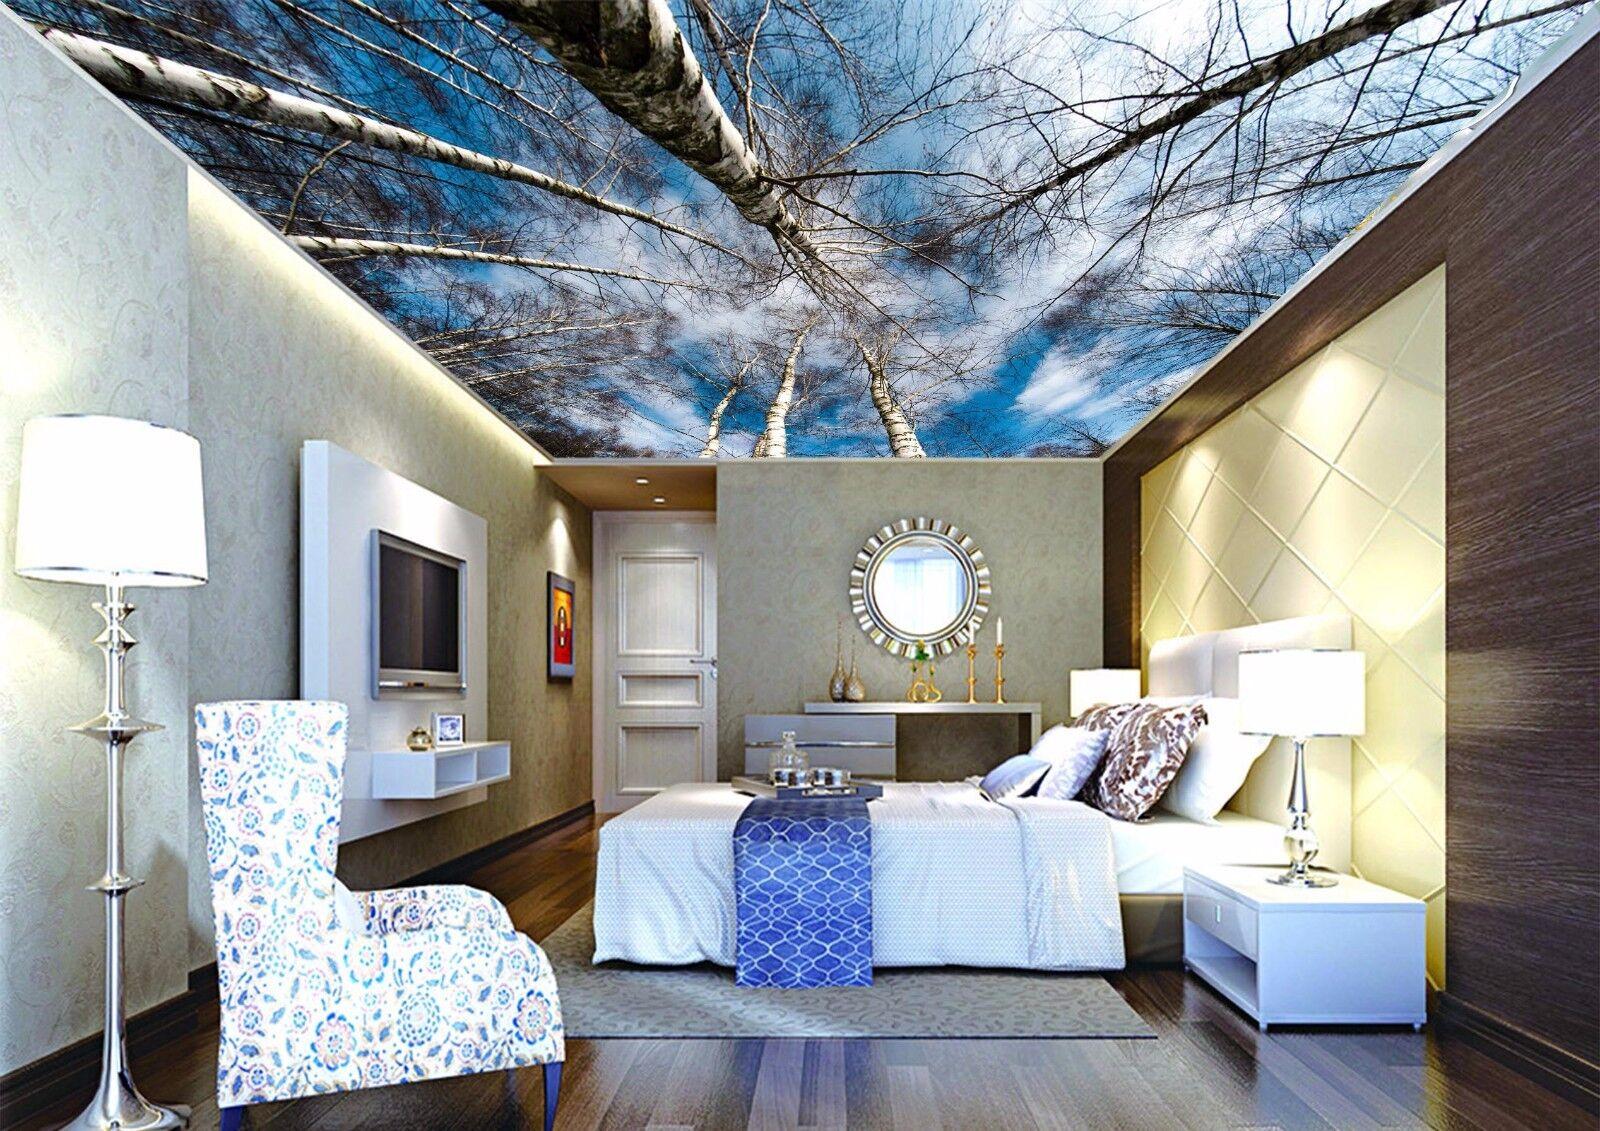 3D Sky Woods 54 Ceiling WallPaper Murals Wall Print Decal Deco AJ WALLPAPER UK